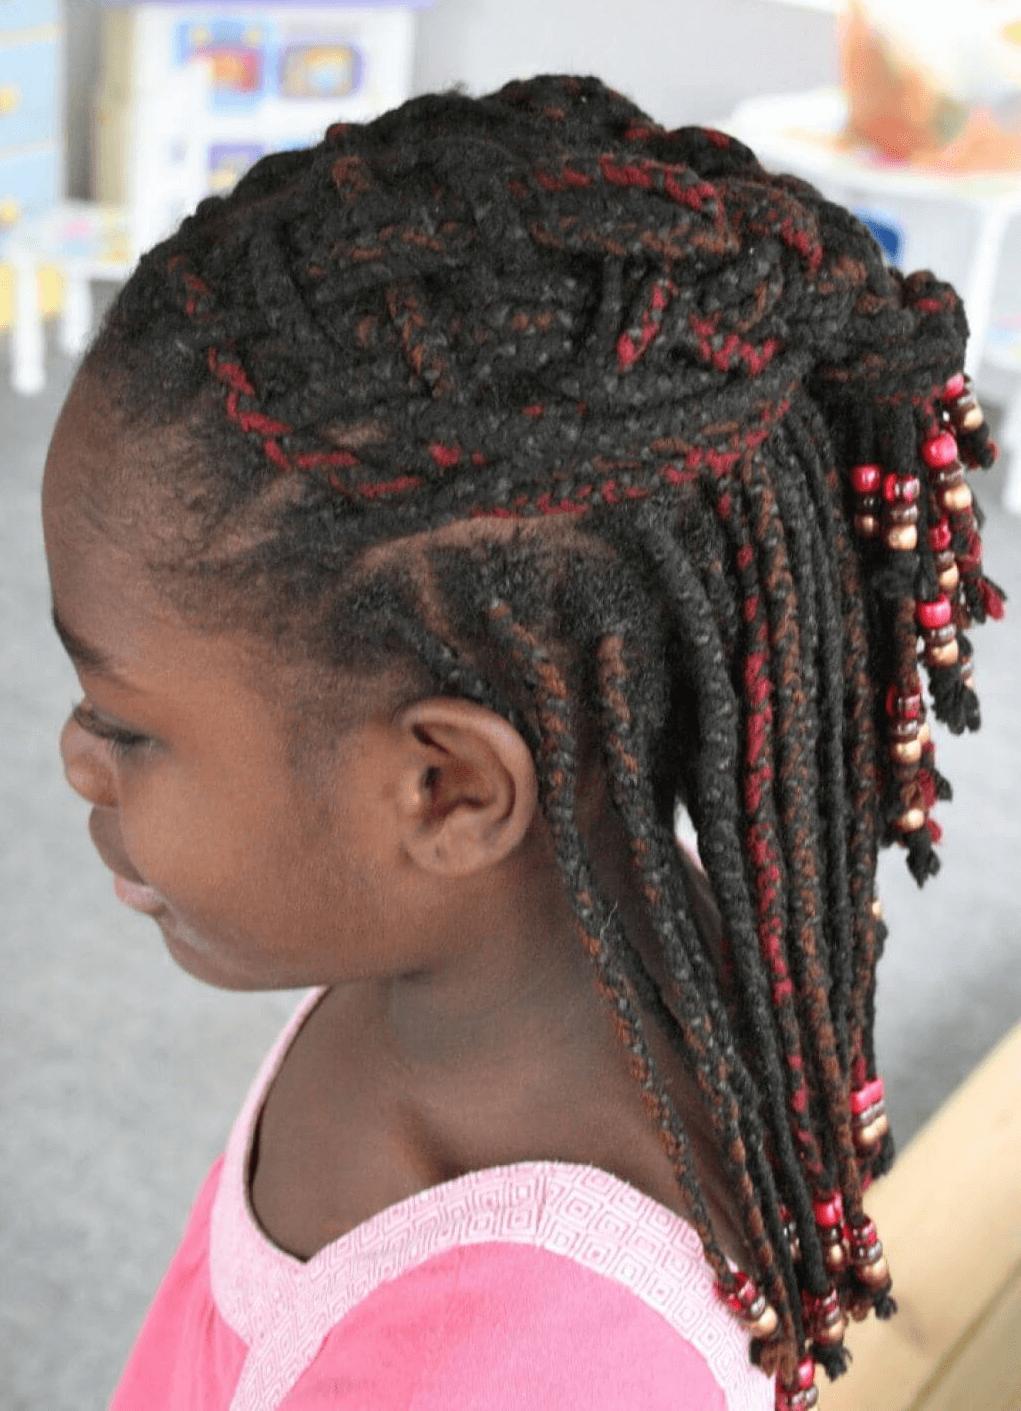 4. Dreadlocks Kids Hairstyles for go to school -Harptimes.com